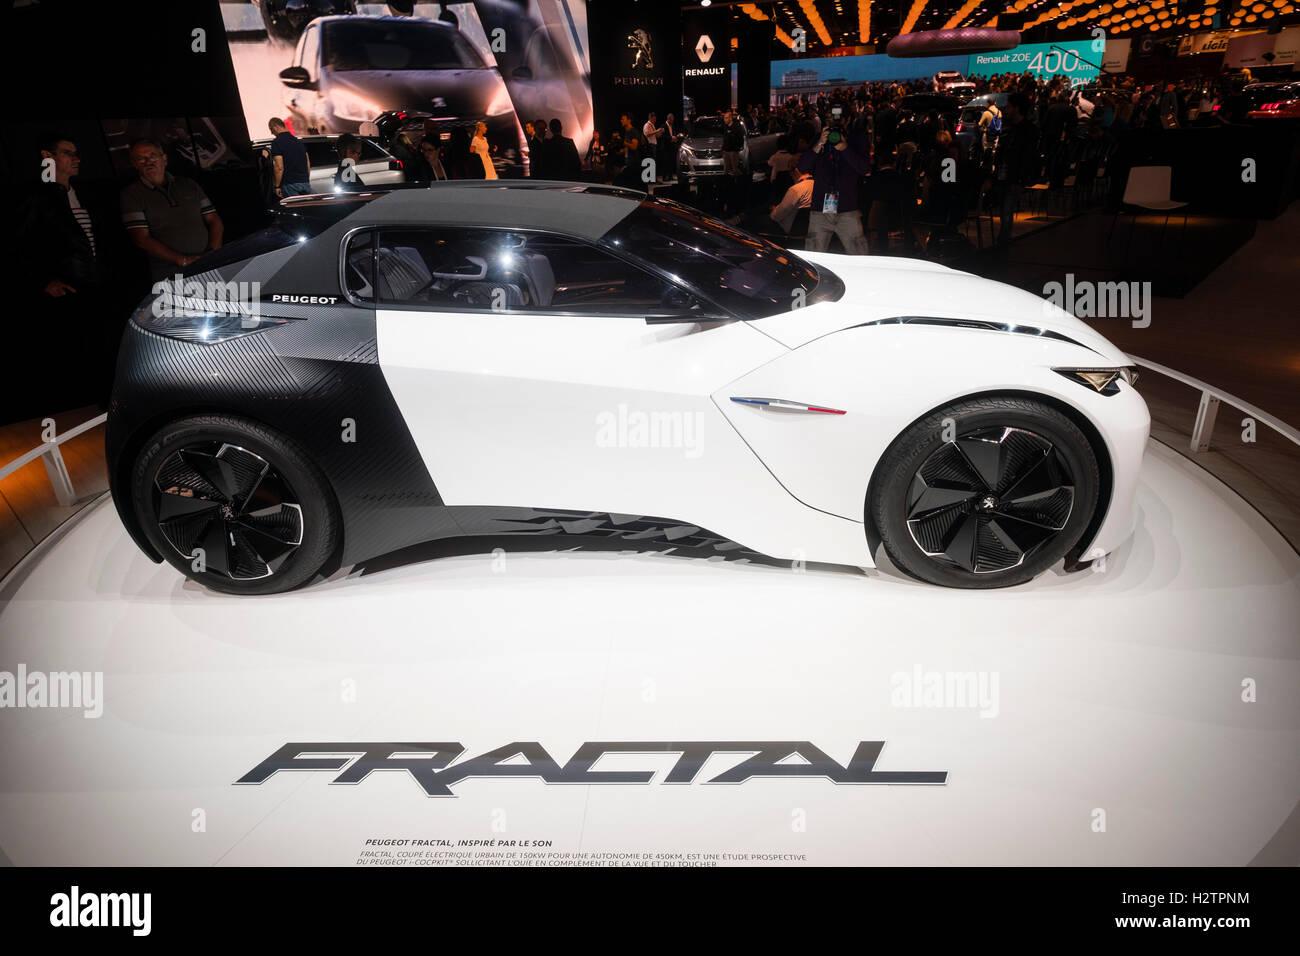 Peugeot Fractal electric concept car at Paris Motor Show 2016 - Stock Image